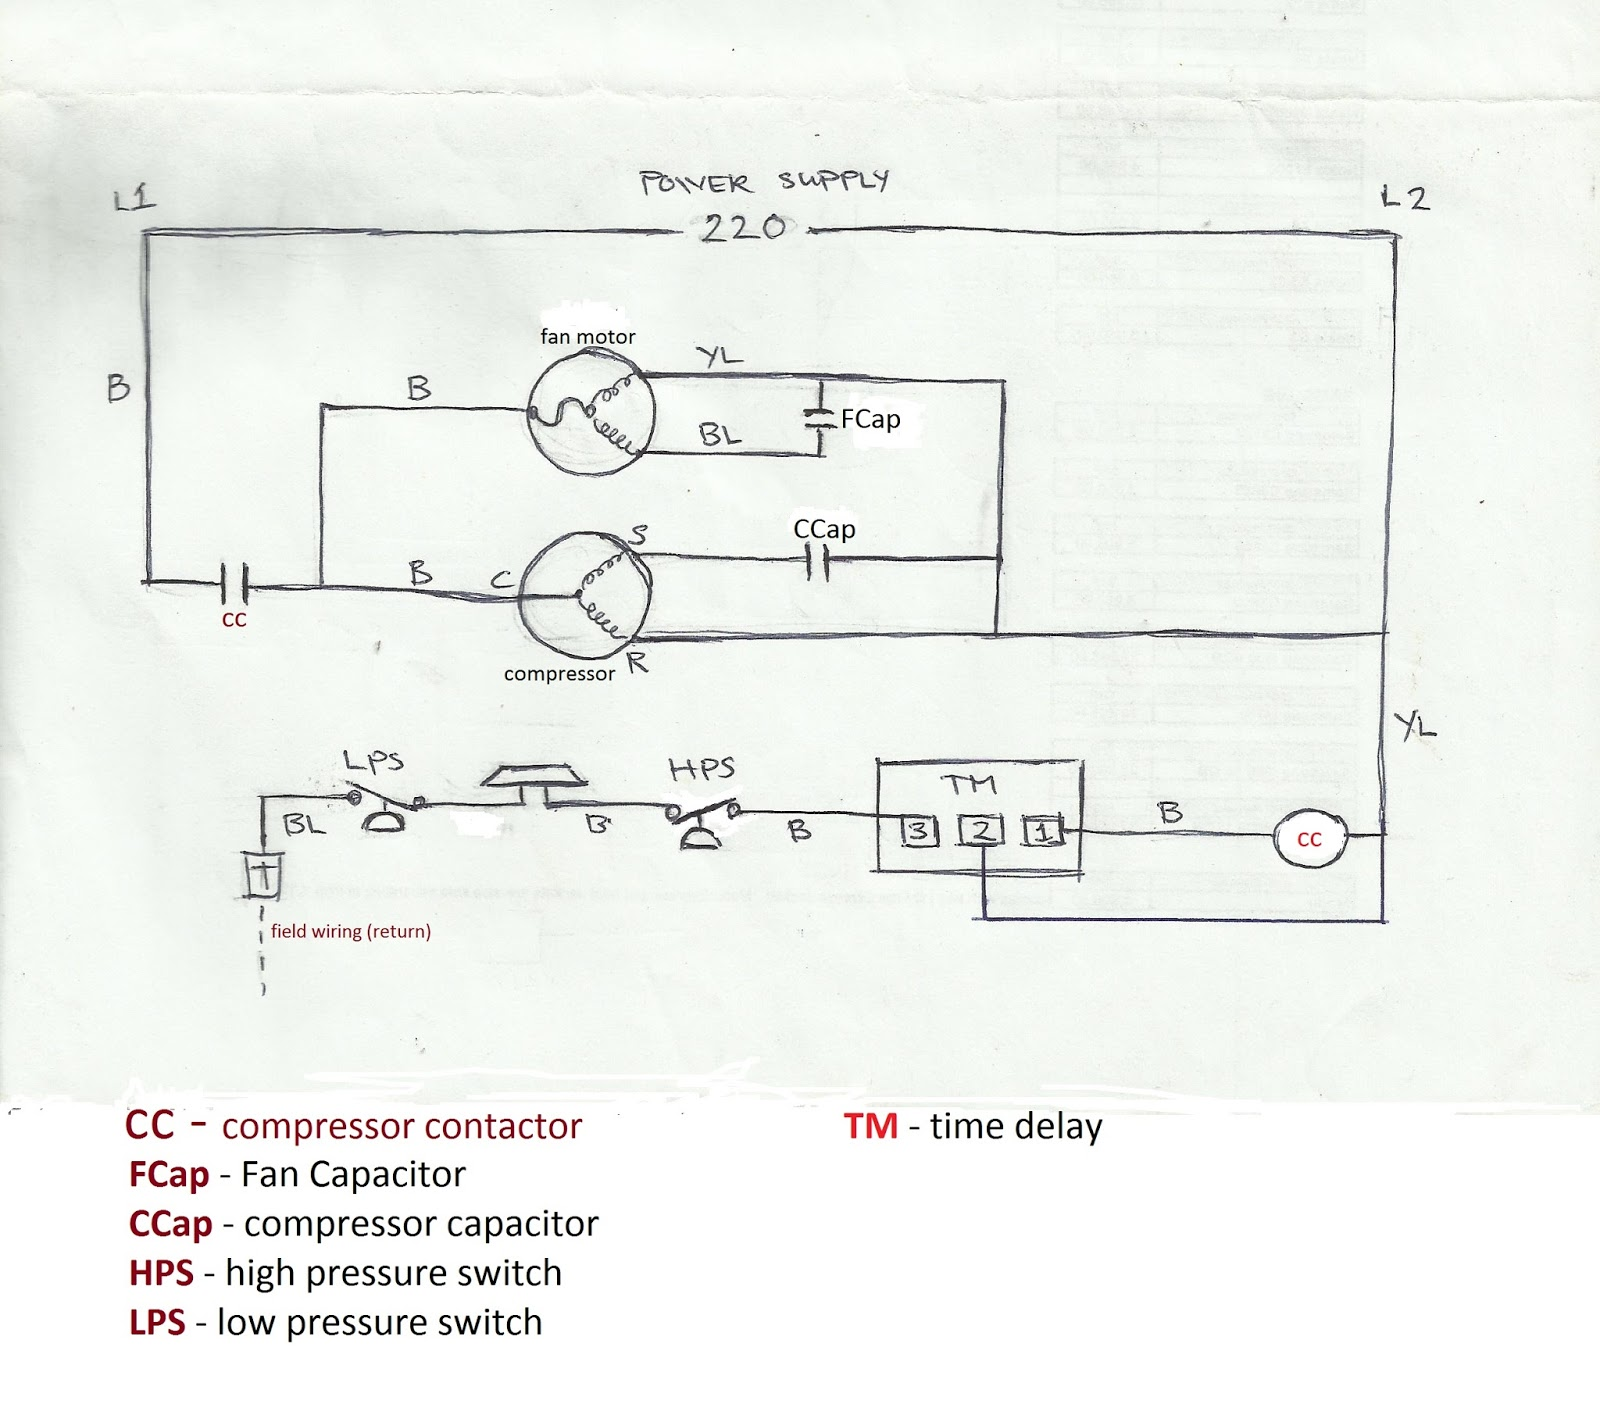 Tremendous Tempstar Air Conditioner Wiring Diagram Wiring Library Wiring Cloud Rometaidewilluminateatxorg